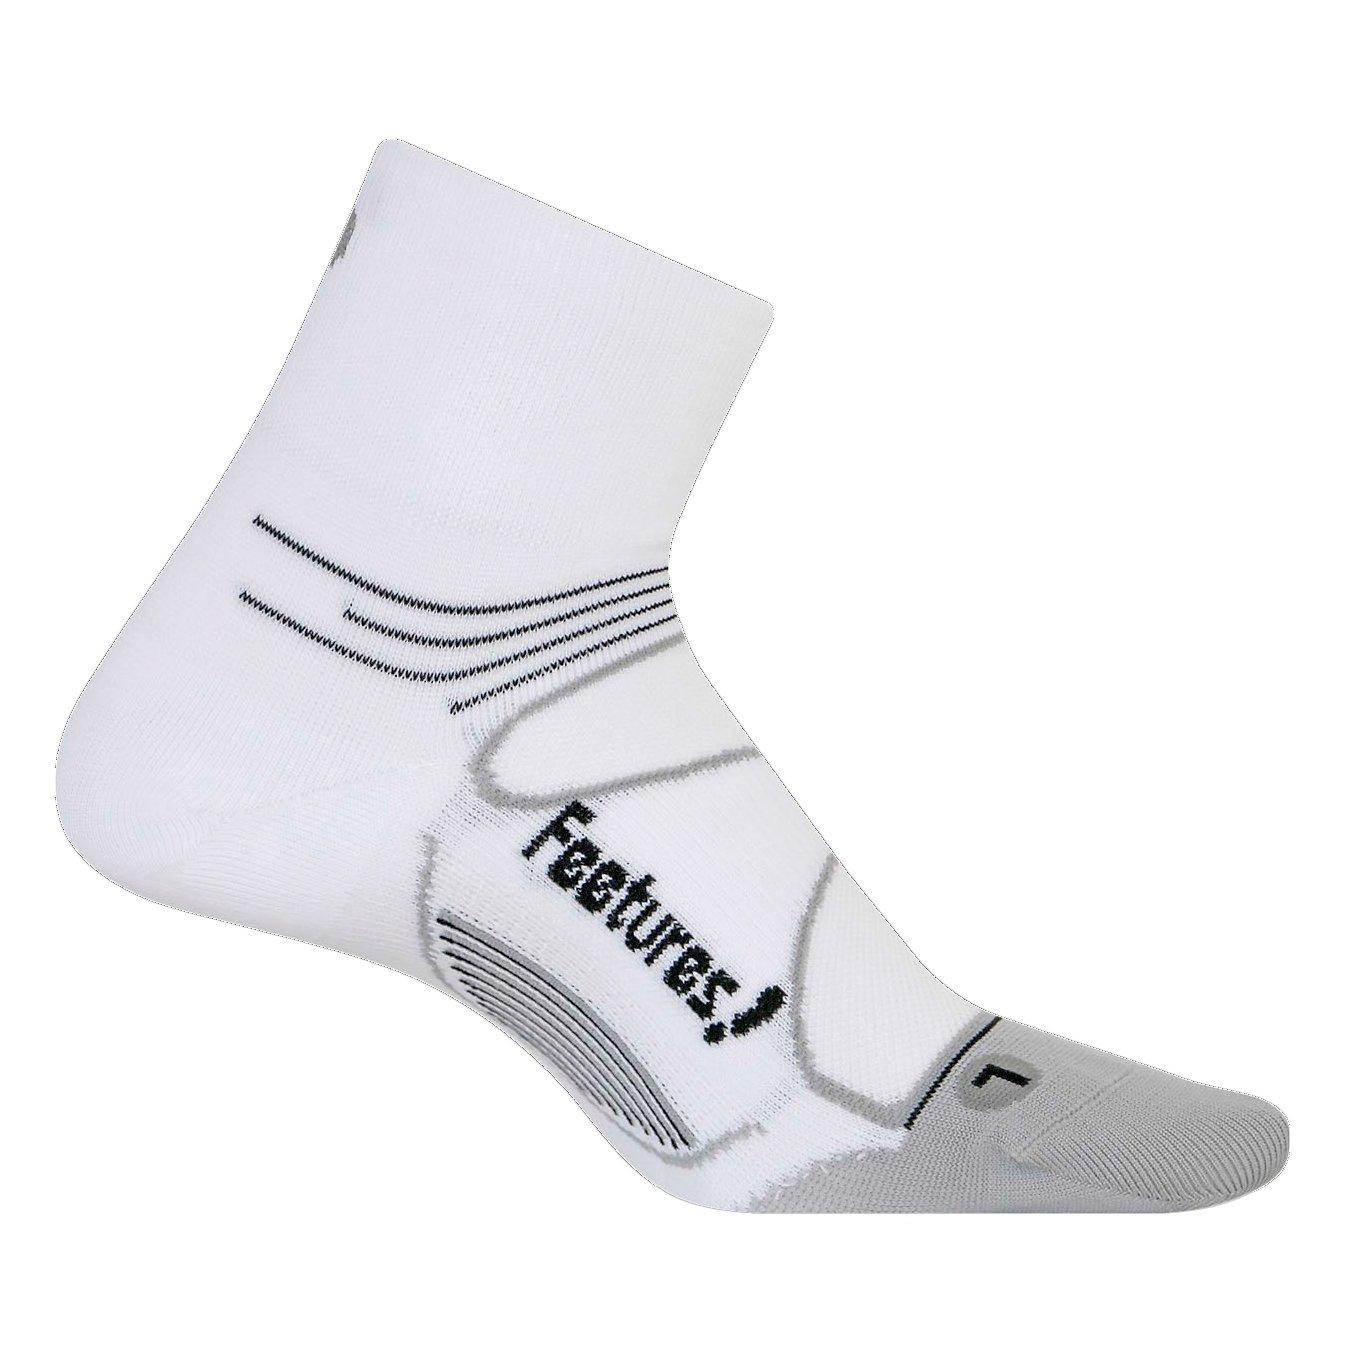 Feetures! SOCKSHOSIERY メンズ B011S89TKY L|White + Black White + Black L